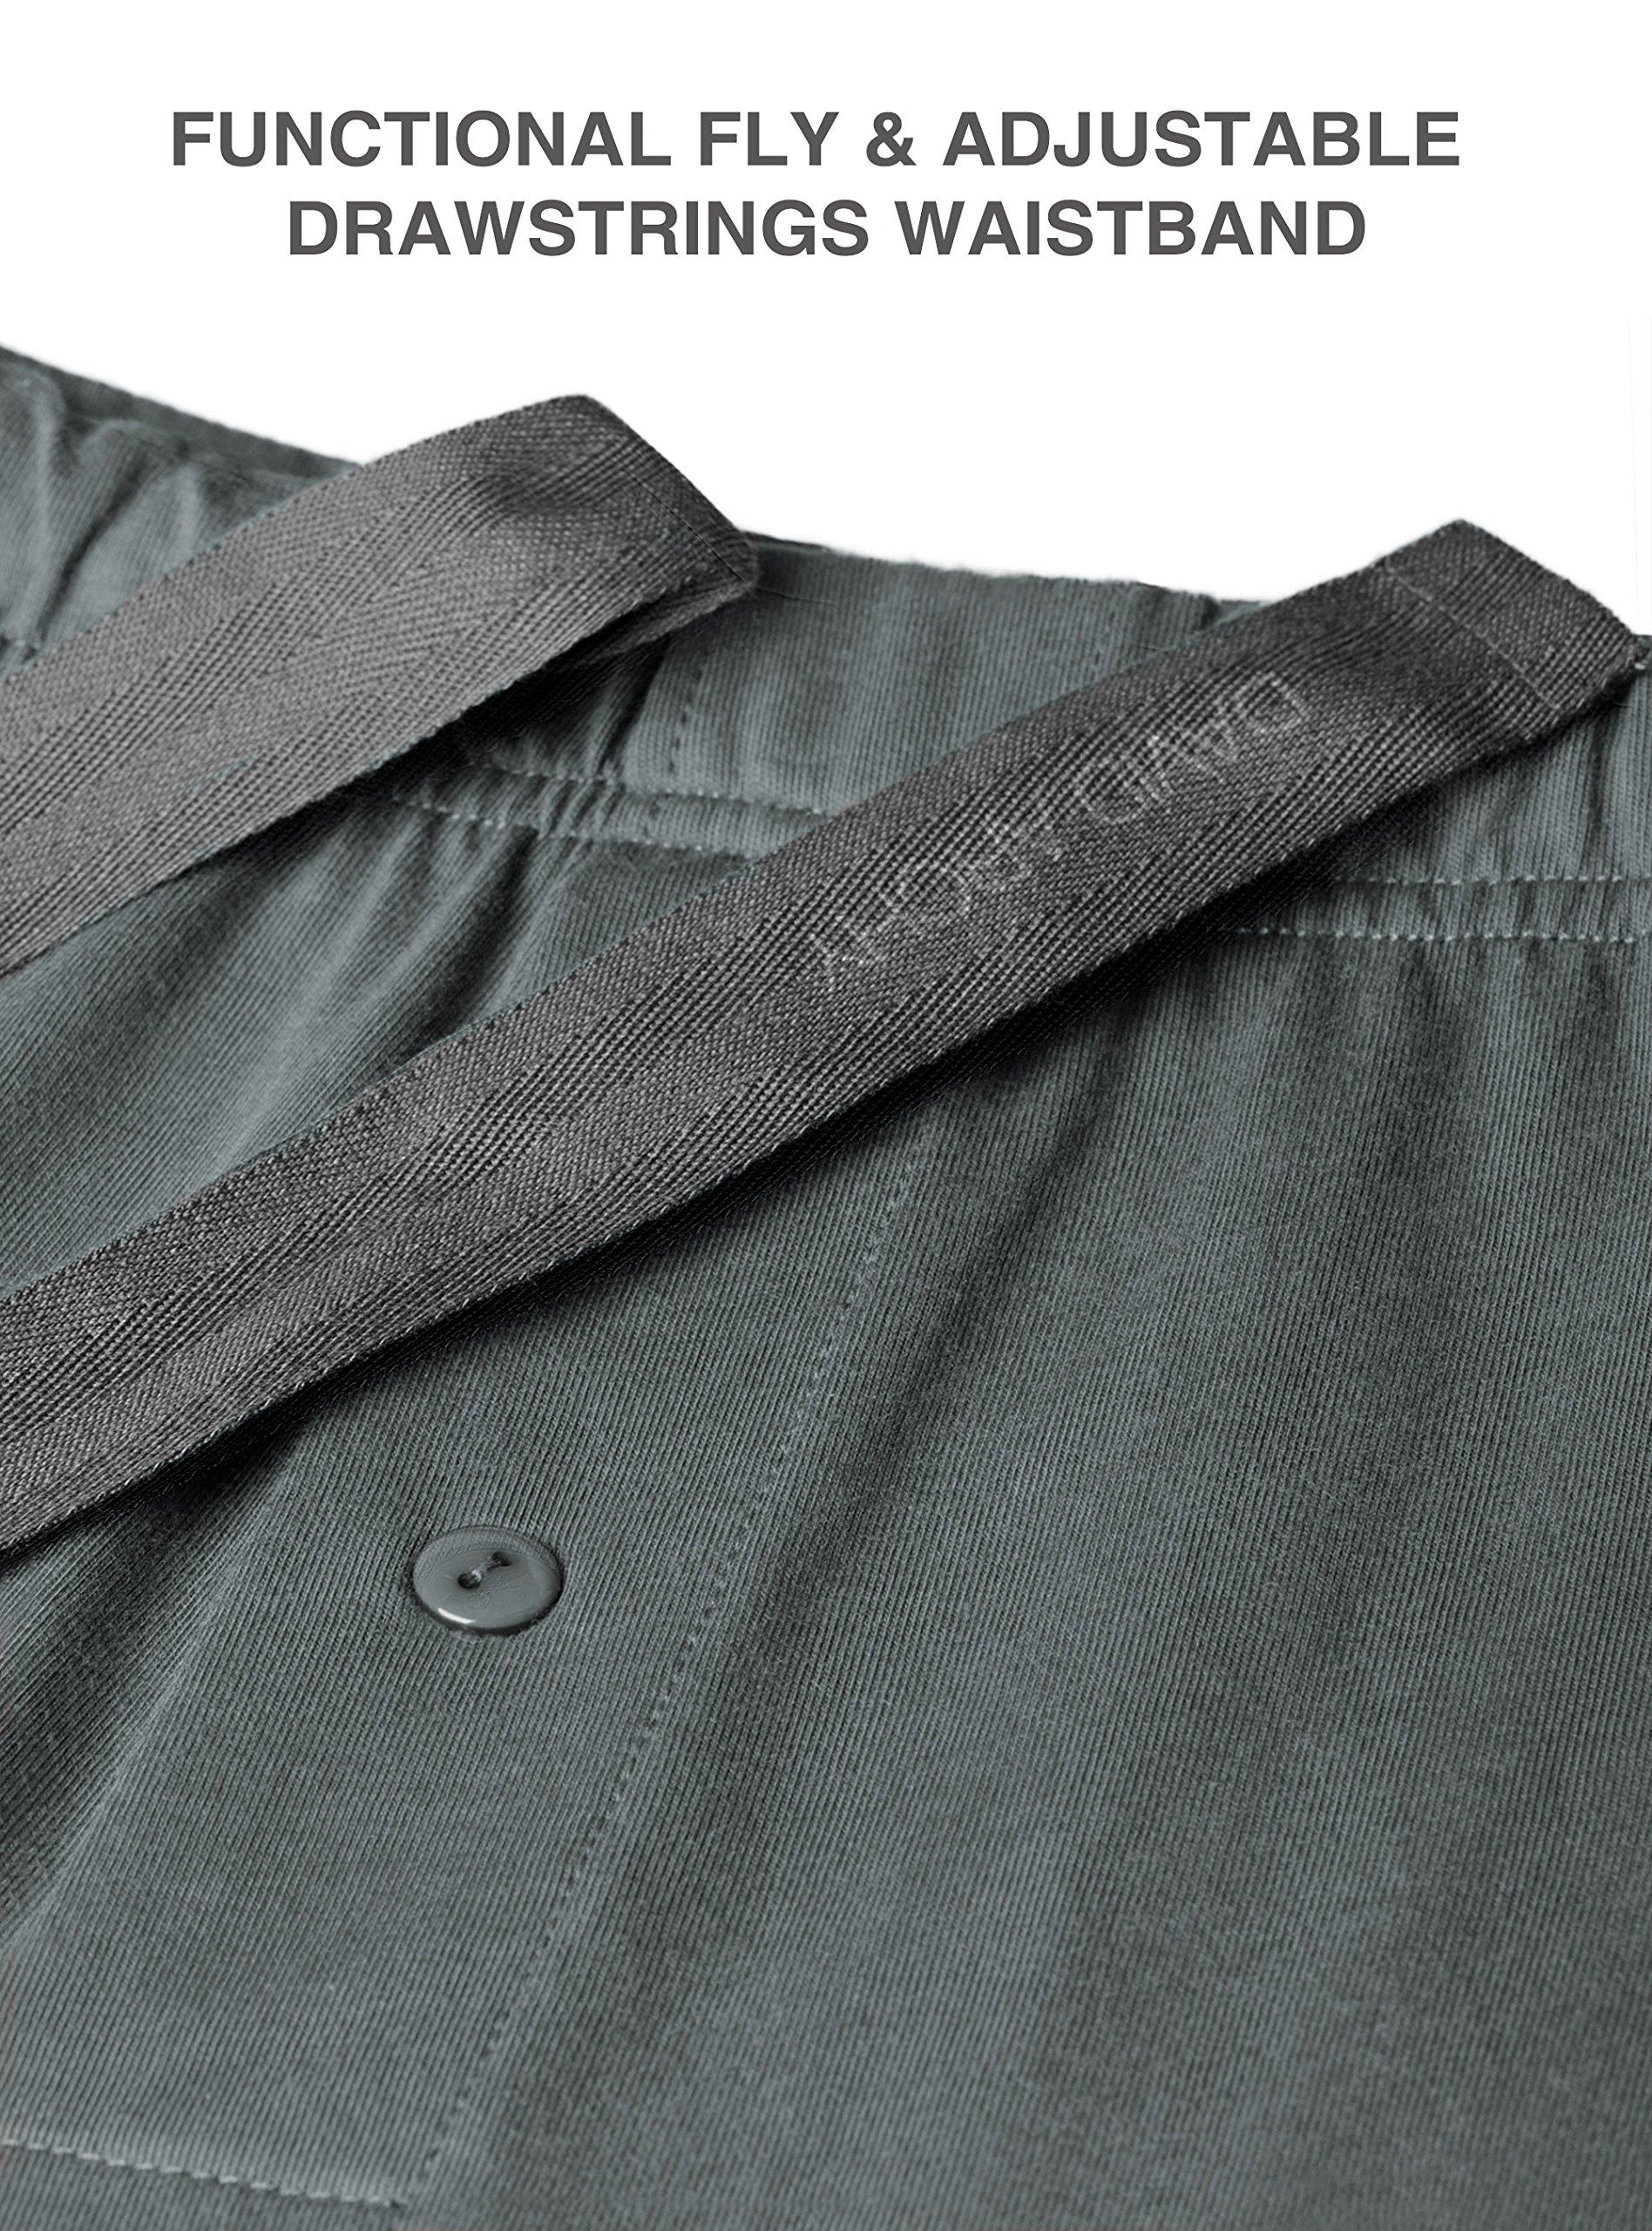 David Archy Men's 100% Cotton Long Button-Down Sleepwear Pajama Set (M, Dark Gray) by David Archy (Image #5)